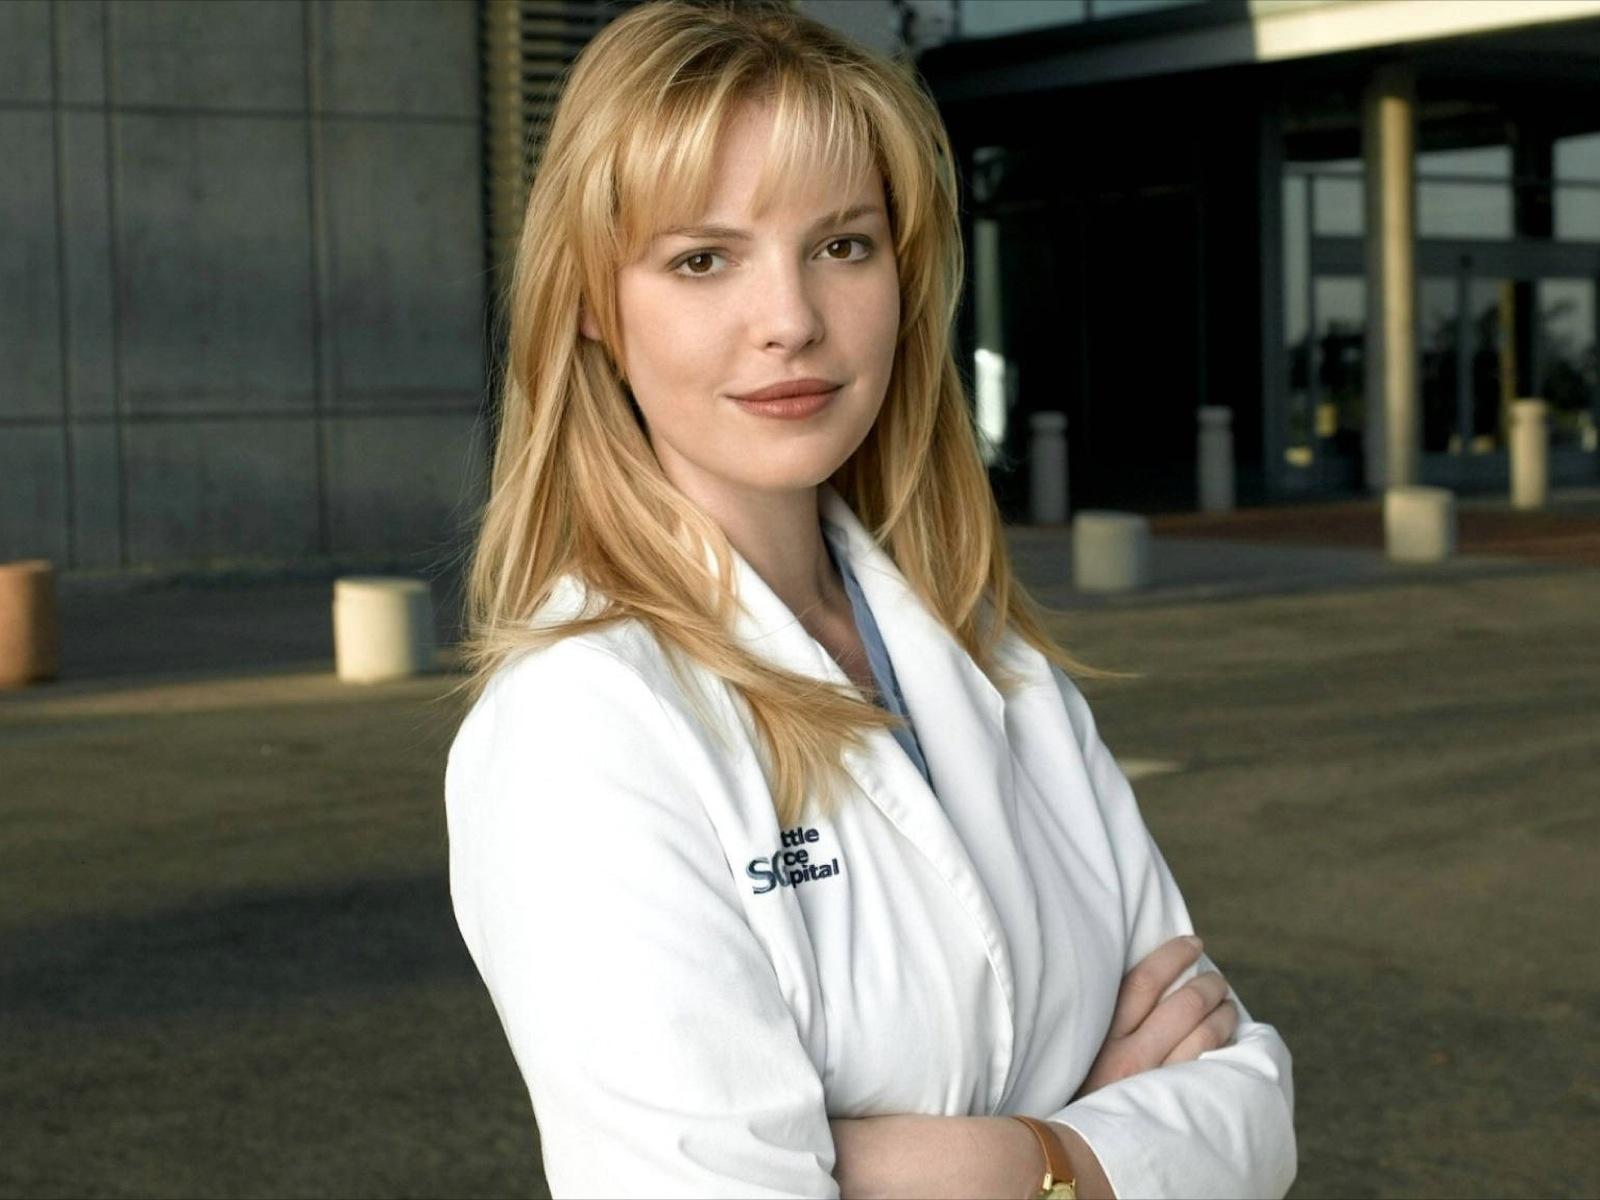 Grey\'s Anatomy season 12 cast rumours: Will Katherine Heigl return ...